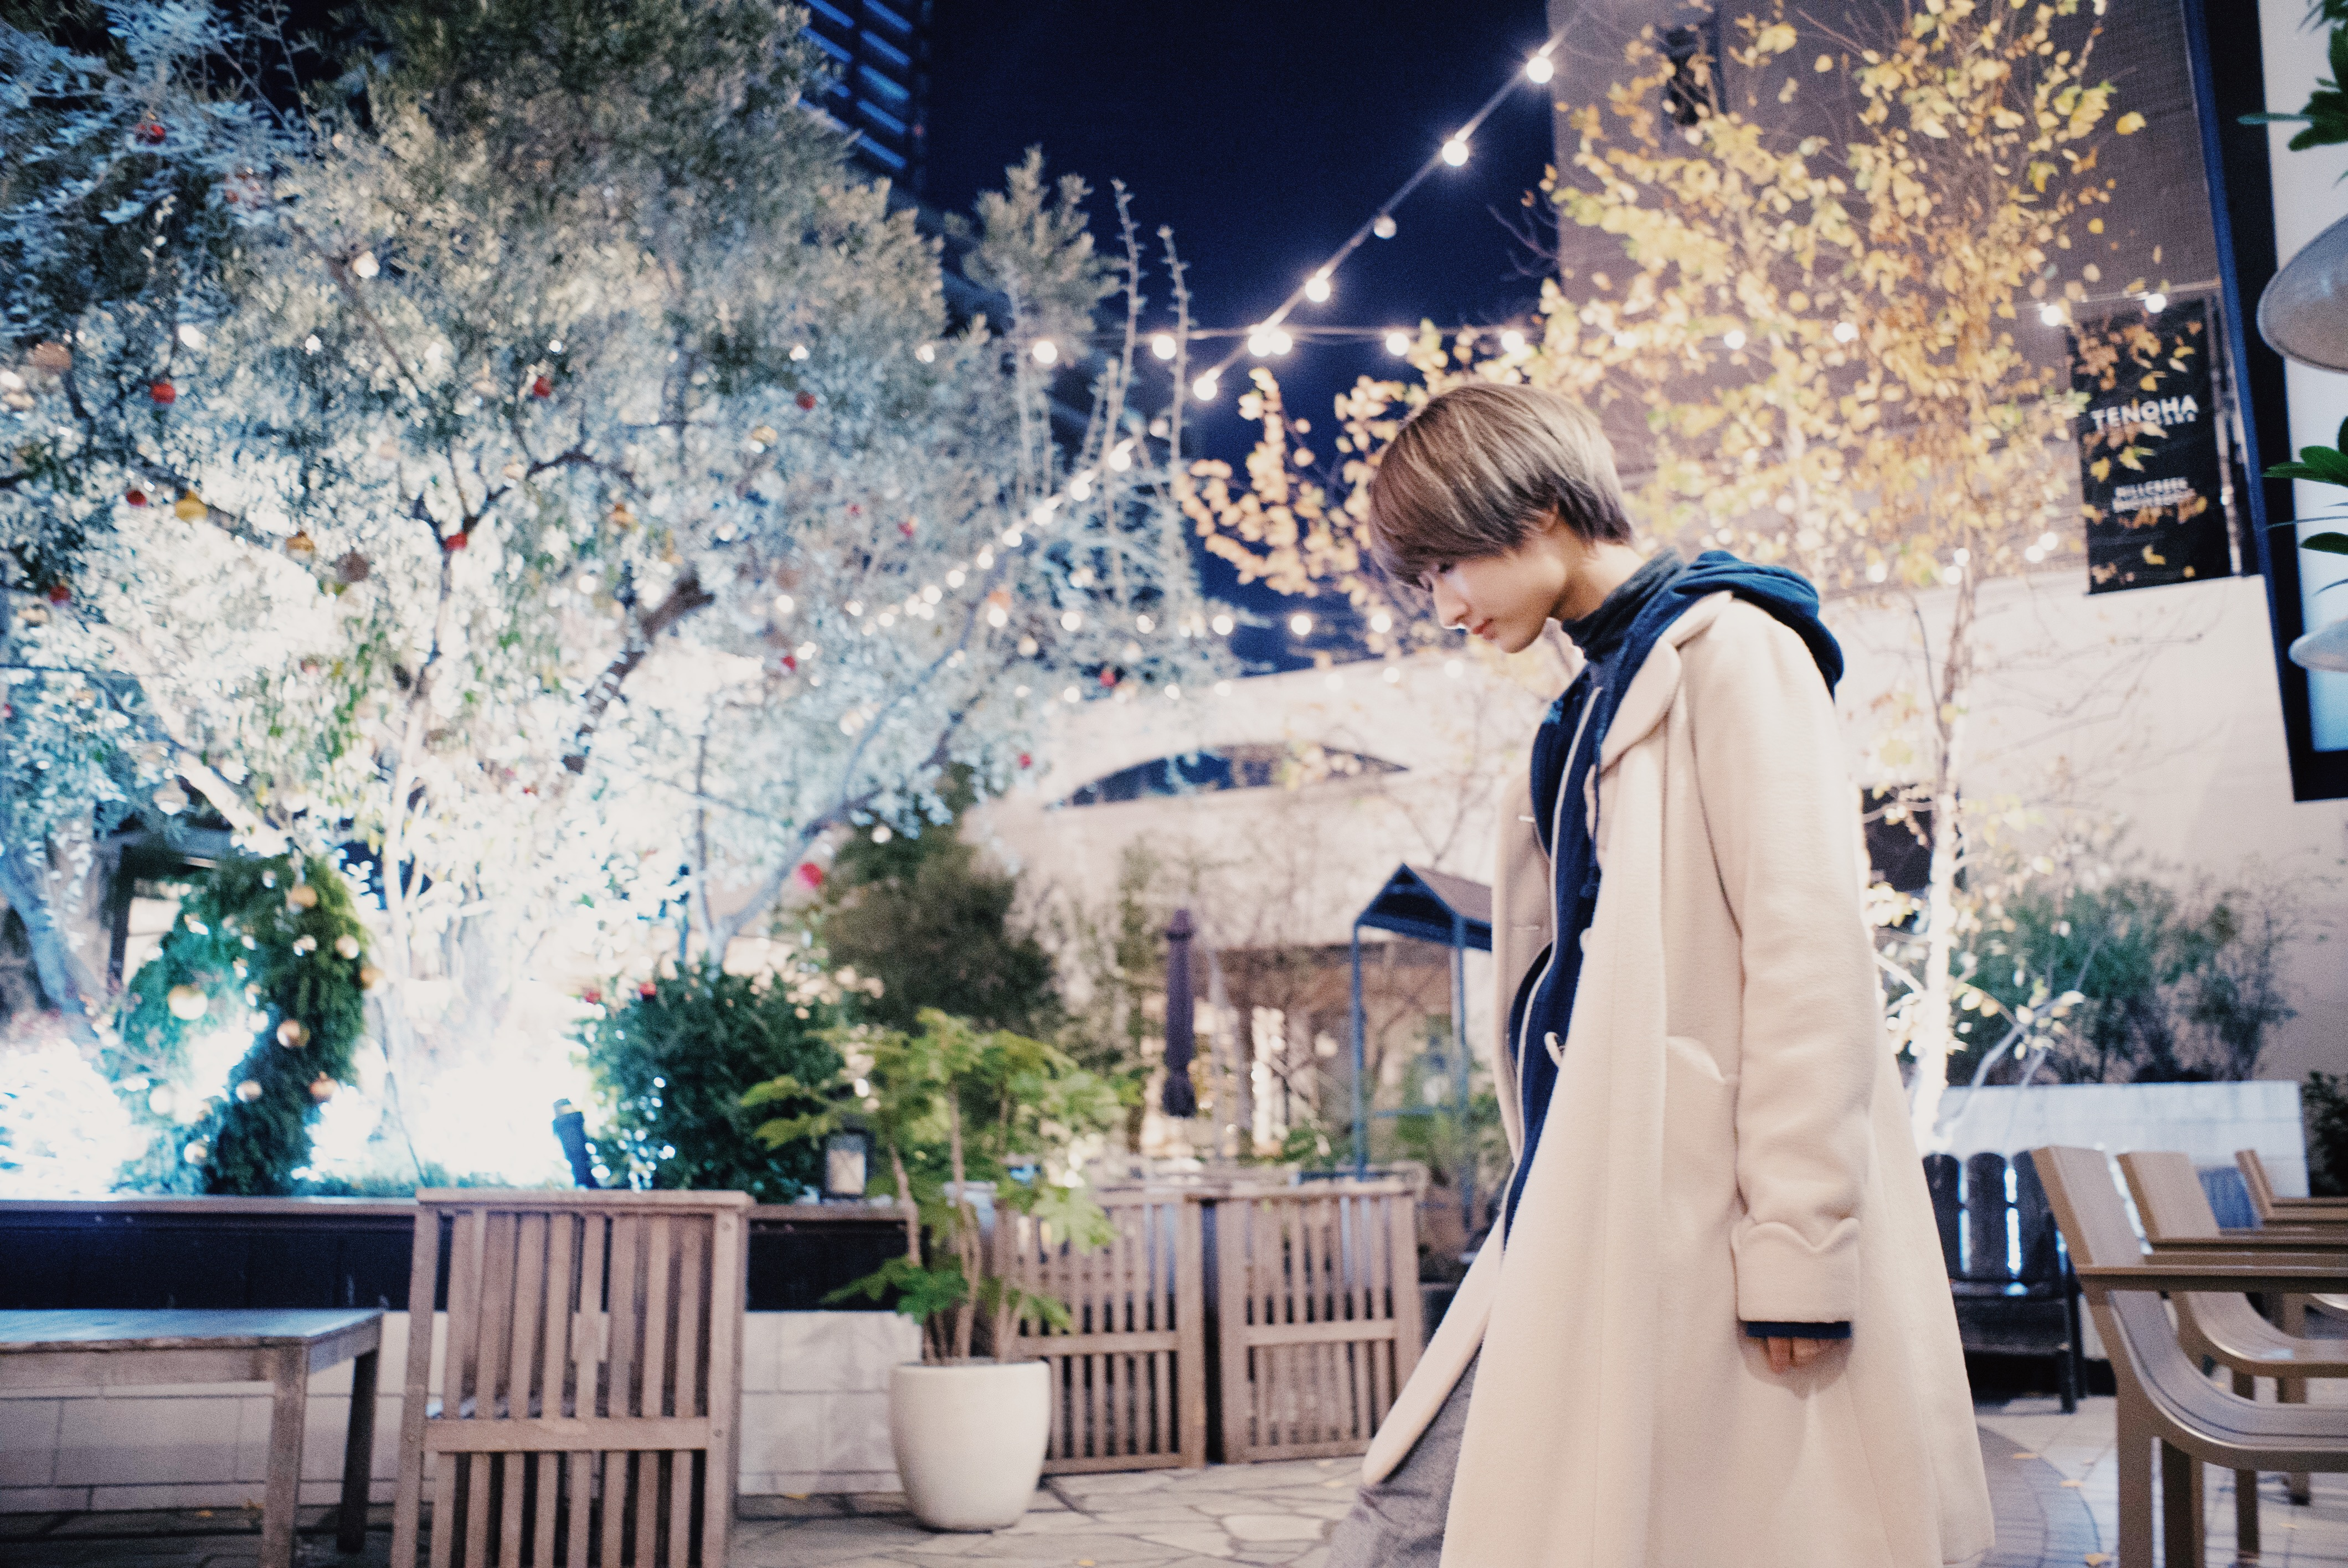 Photographer: Takutaki